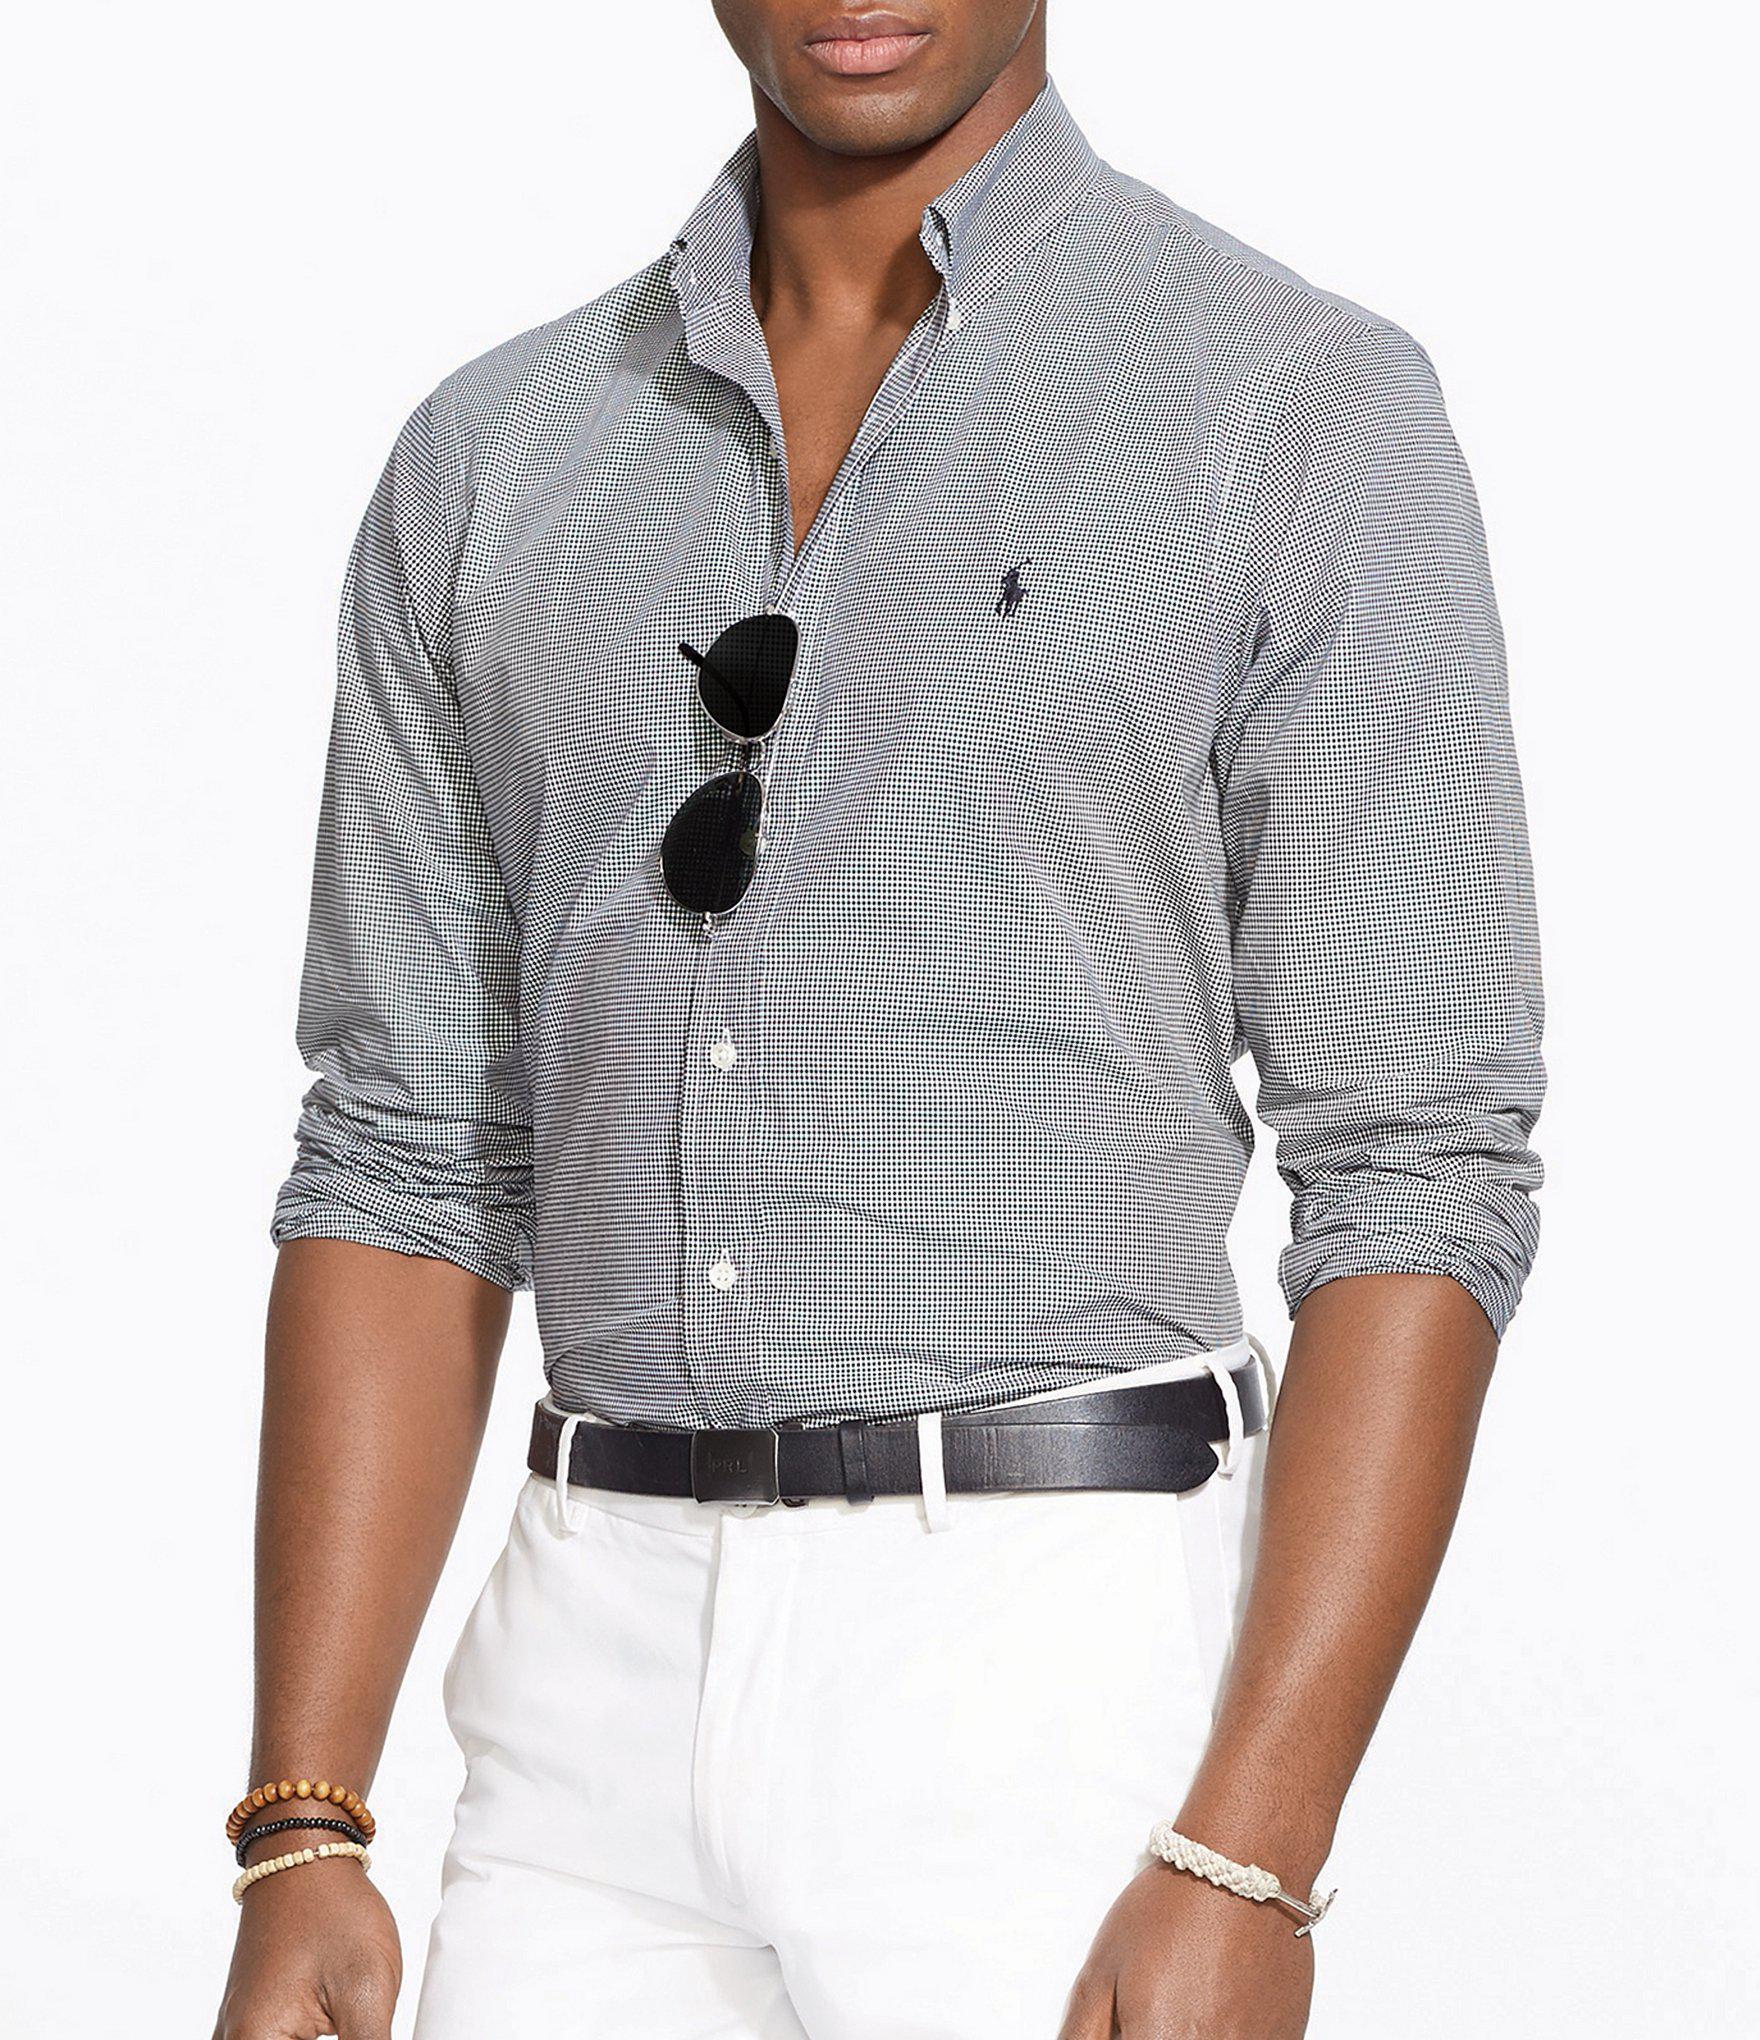 64aa12f7c Lyst - Polo Ralph Lauren Checked Poplin Shirt in White for Men ...